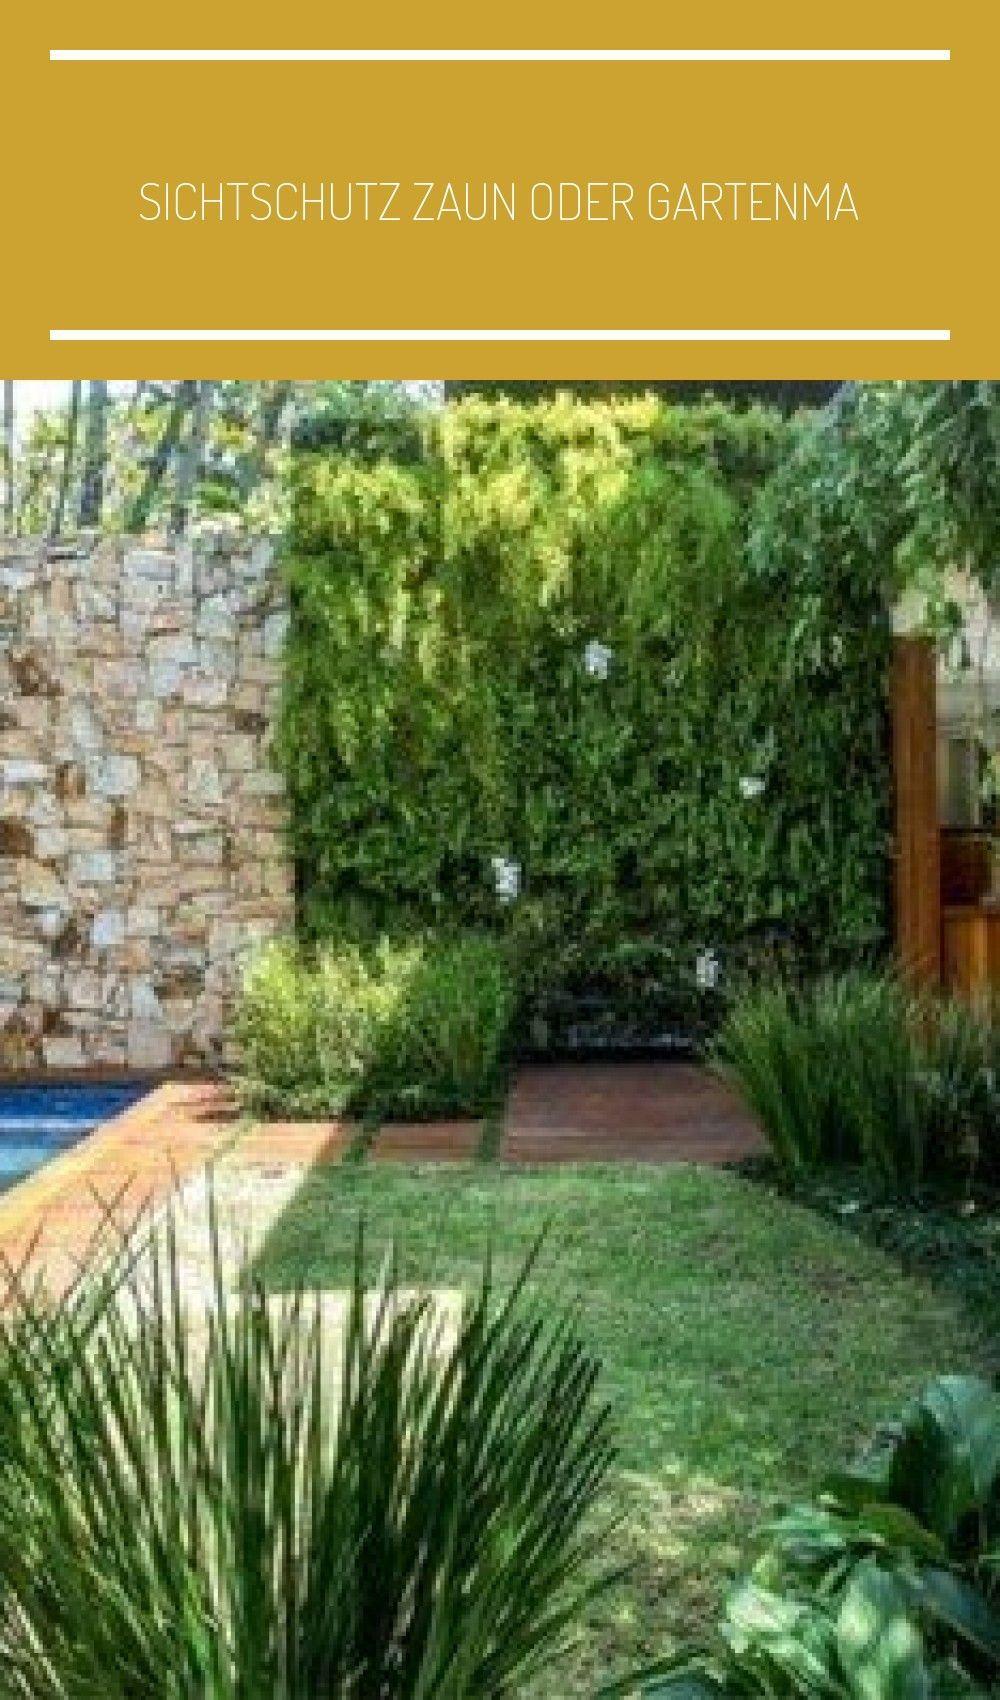 Privacy Fence Or Gardening In 2020 Garten Pflanzideen Garten